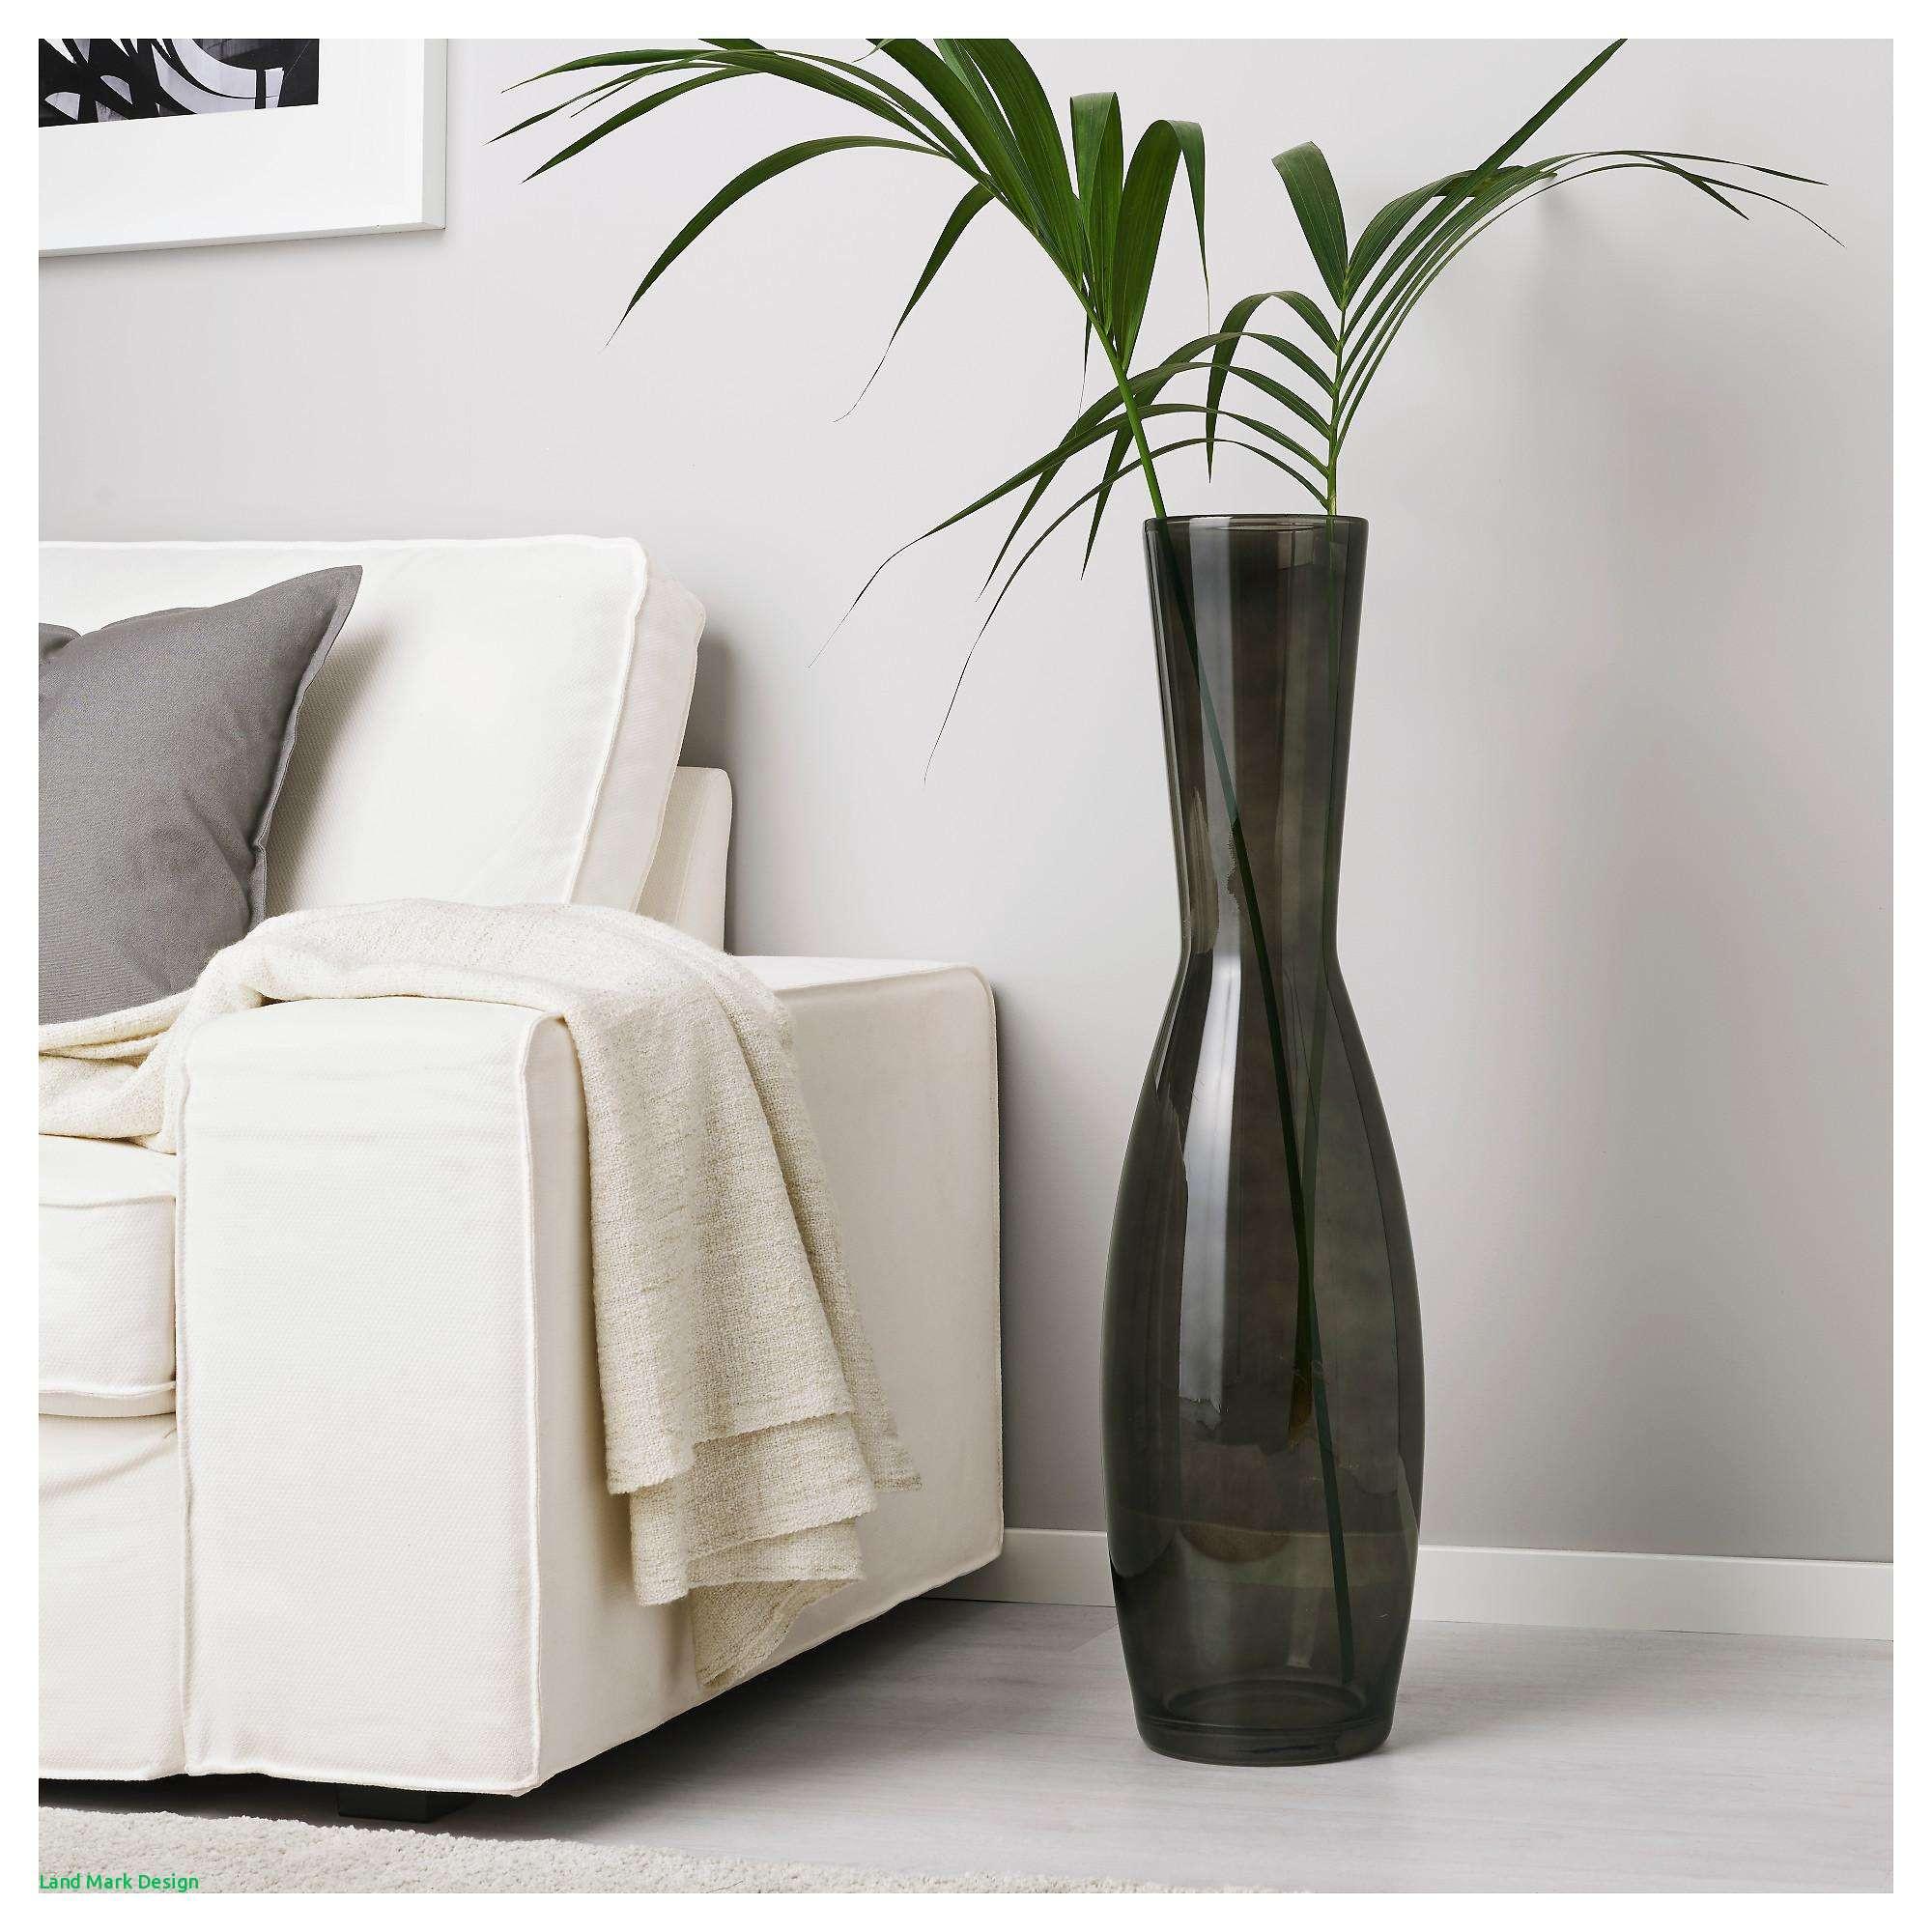 tall floor vases ikea of ikea floor vases design home design with regard to full size of living room concrete vases inspirational ikea floor vases tall large size of living